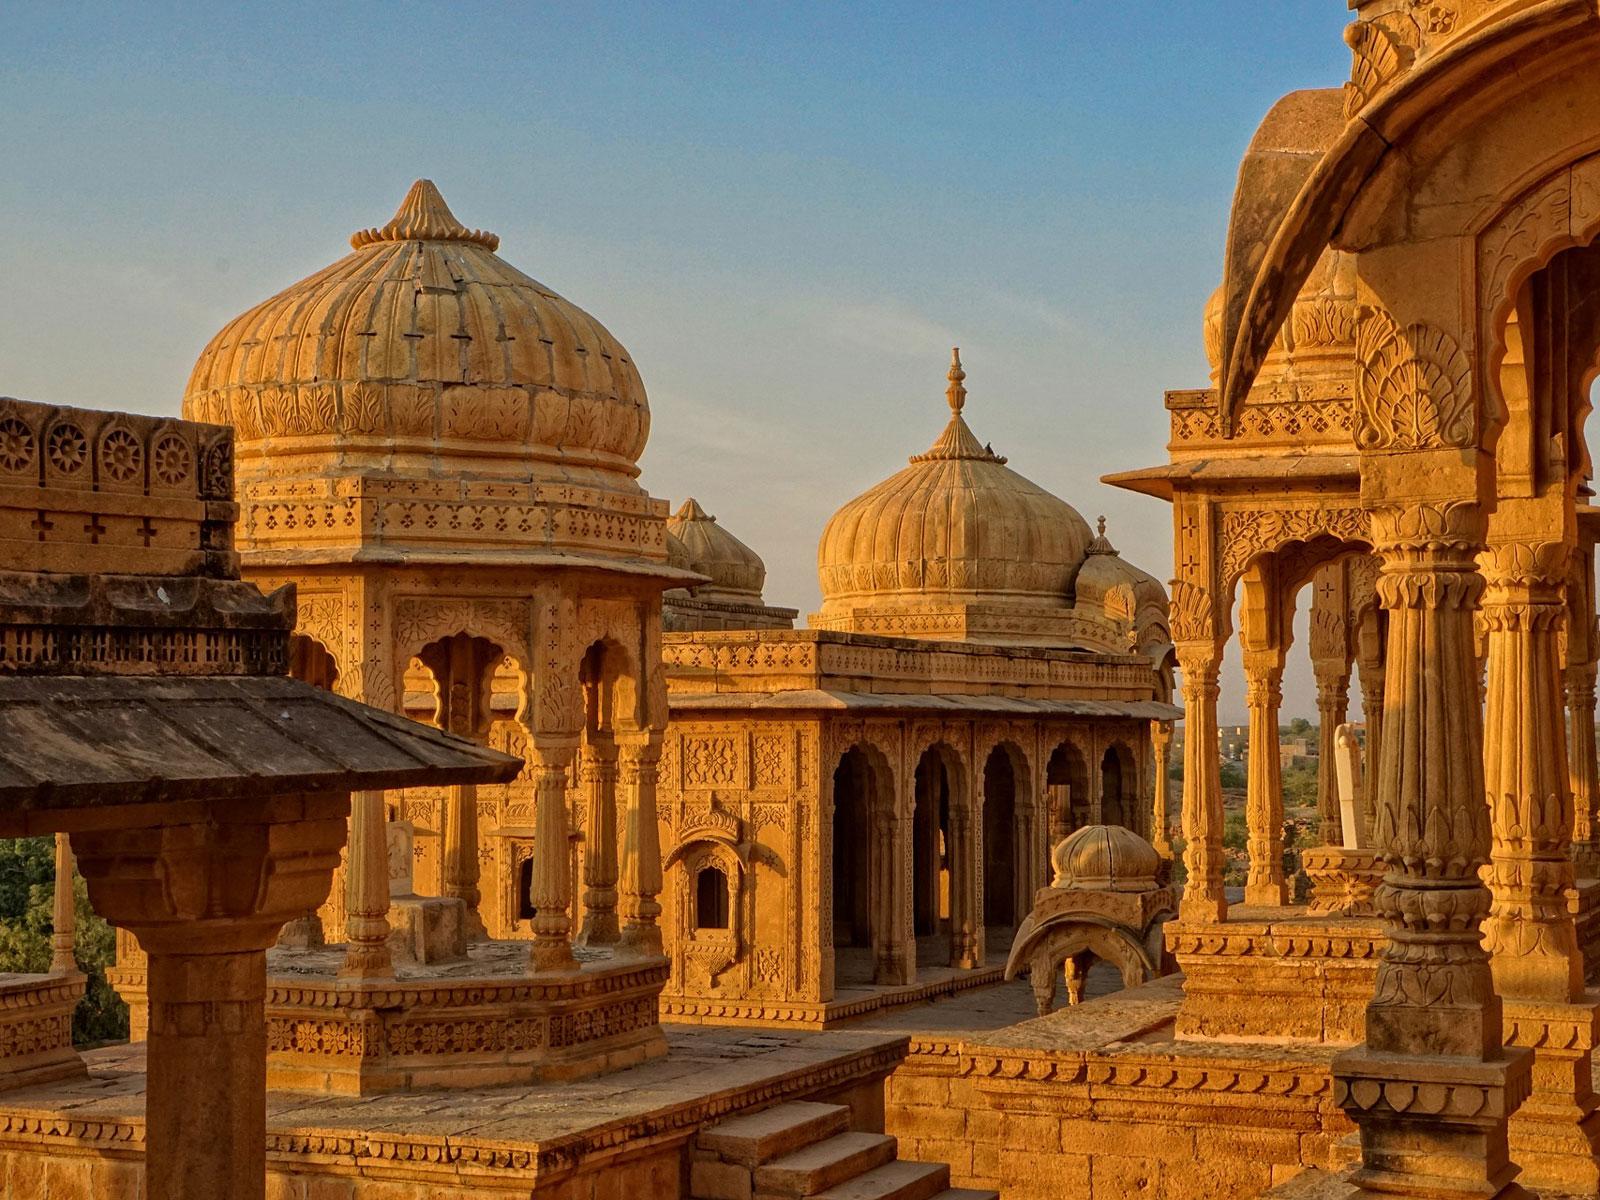 rondreis india jaisalmer hoogtepunt 10